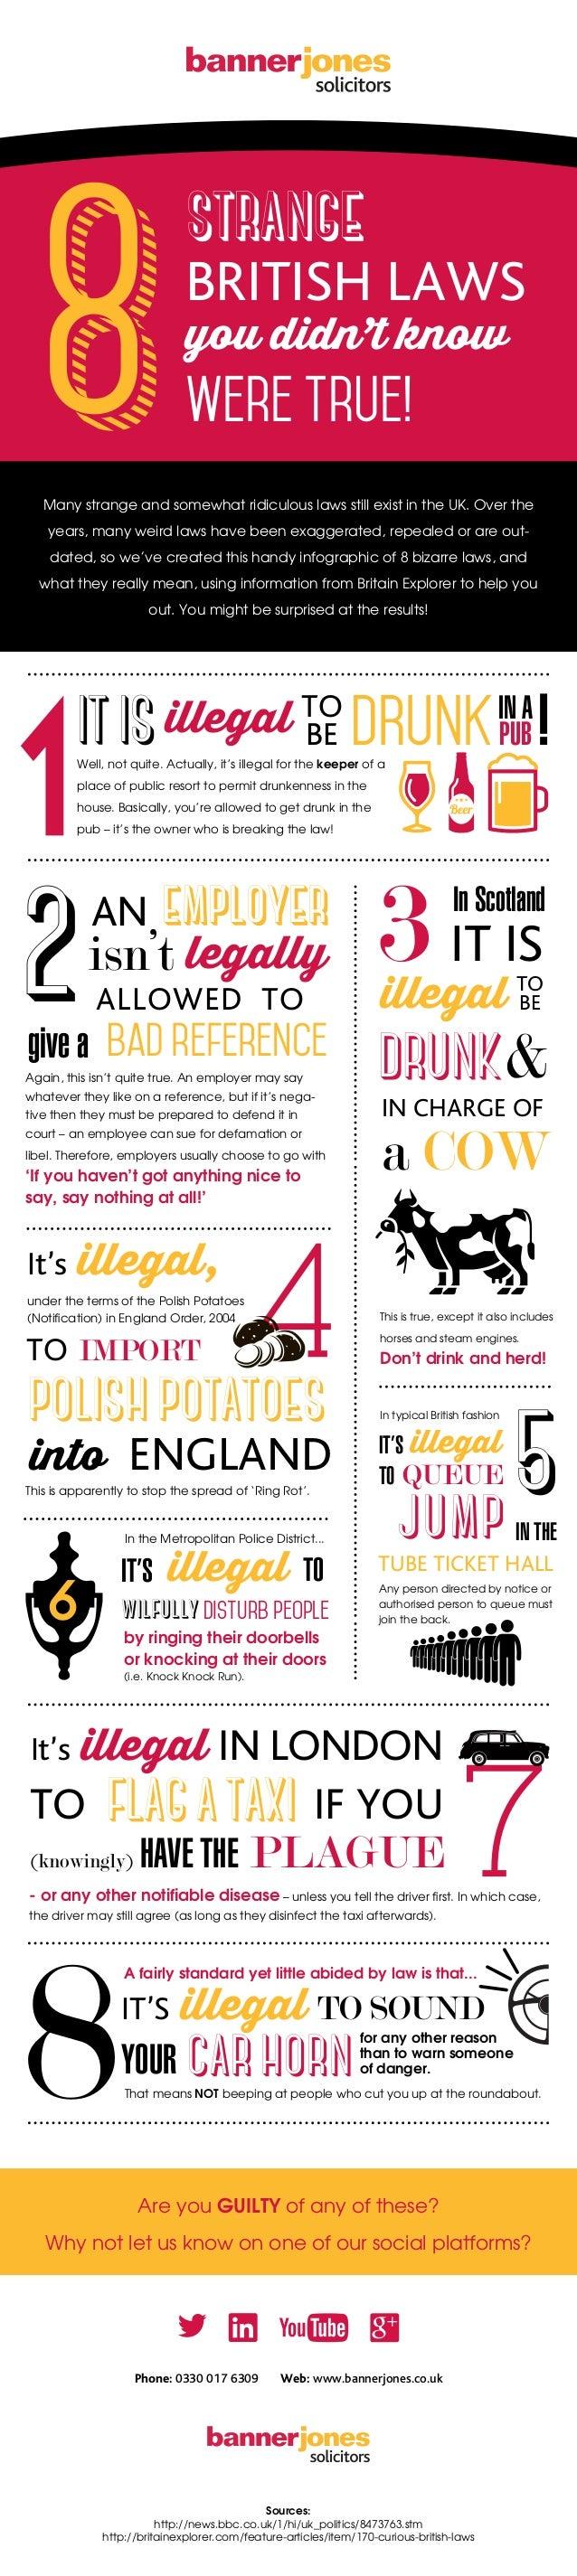 strange BRITISH LAWS you didn't know were true! Phone: 0330 017 6309 Web: www.bannerjones.co.uk Sources: http://news.bbc.c...